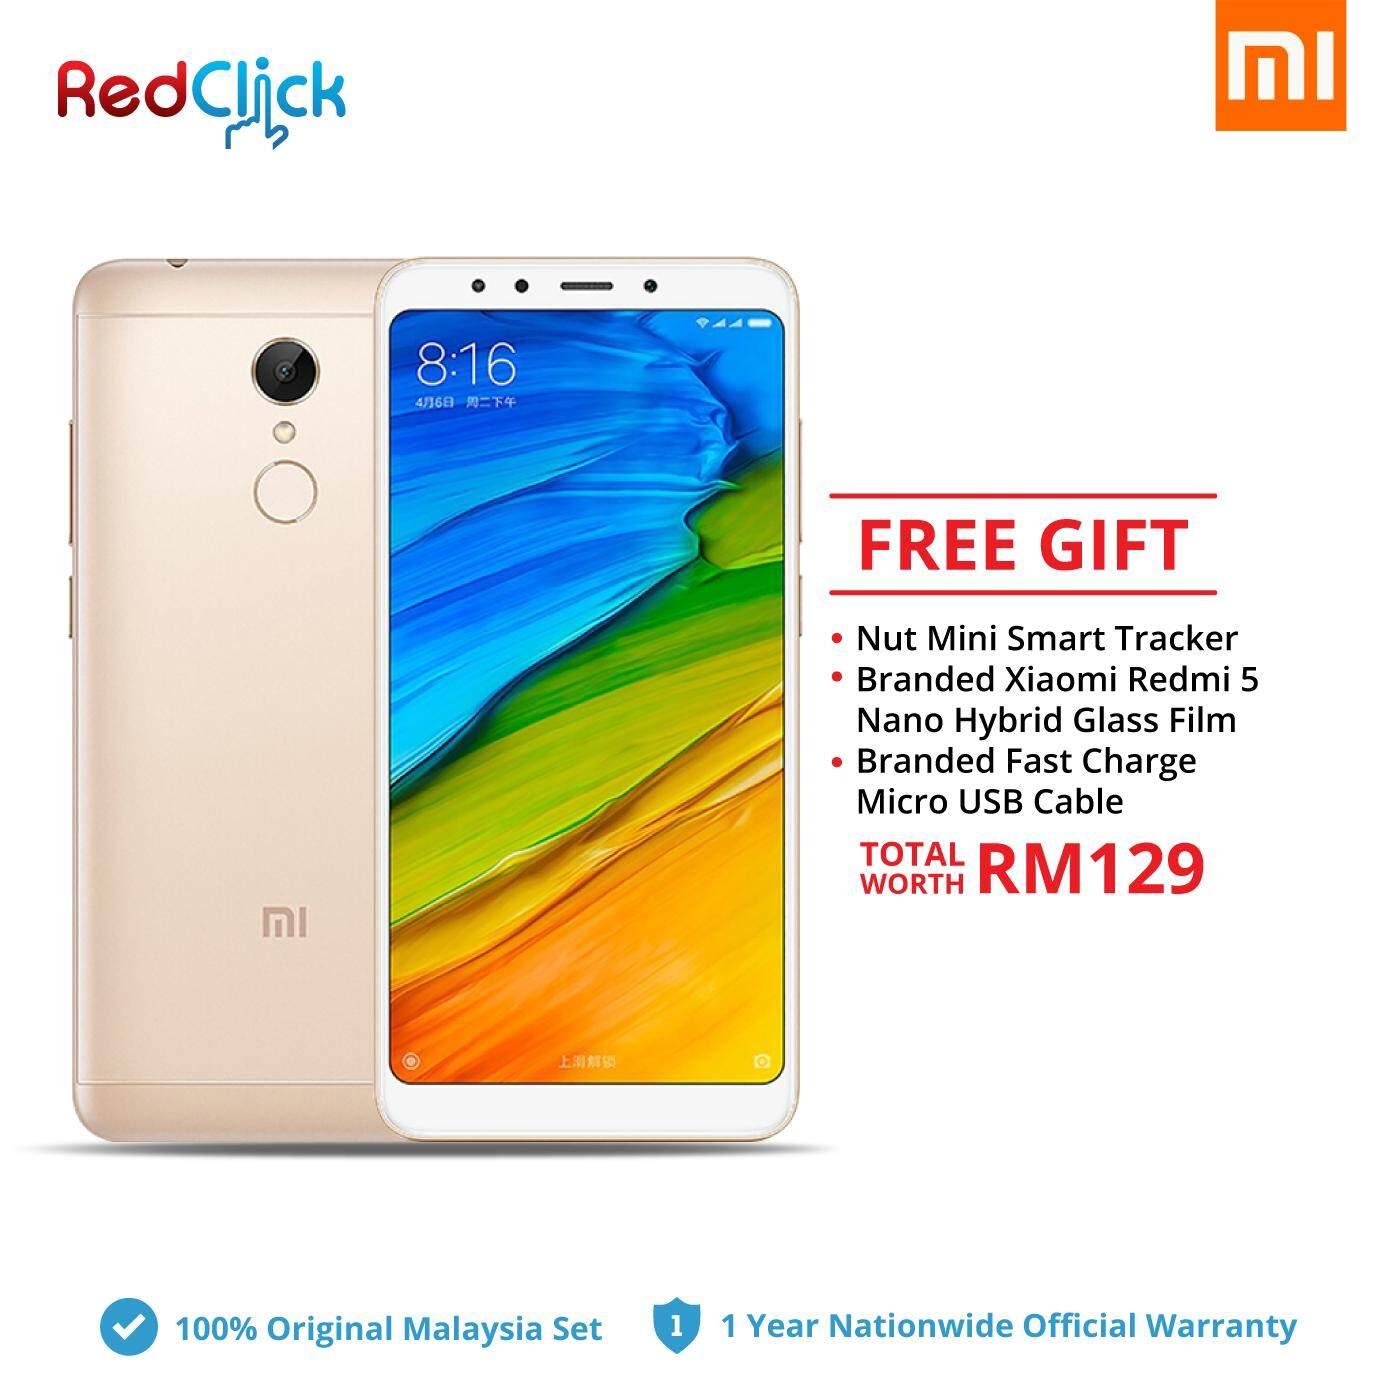 Xiaomi Redmi 5 (3GB/32GB) + 3 Free Gift Worth RM129